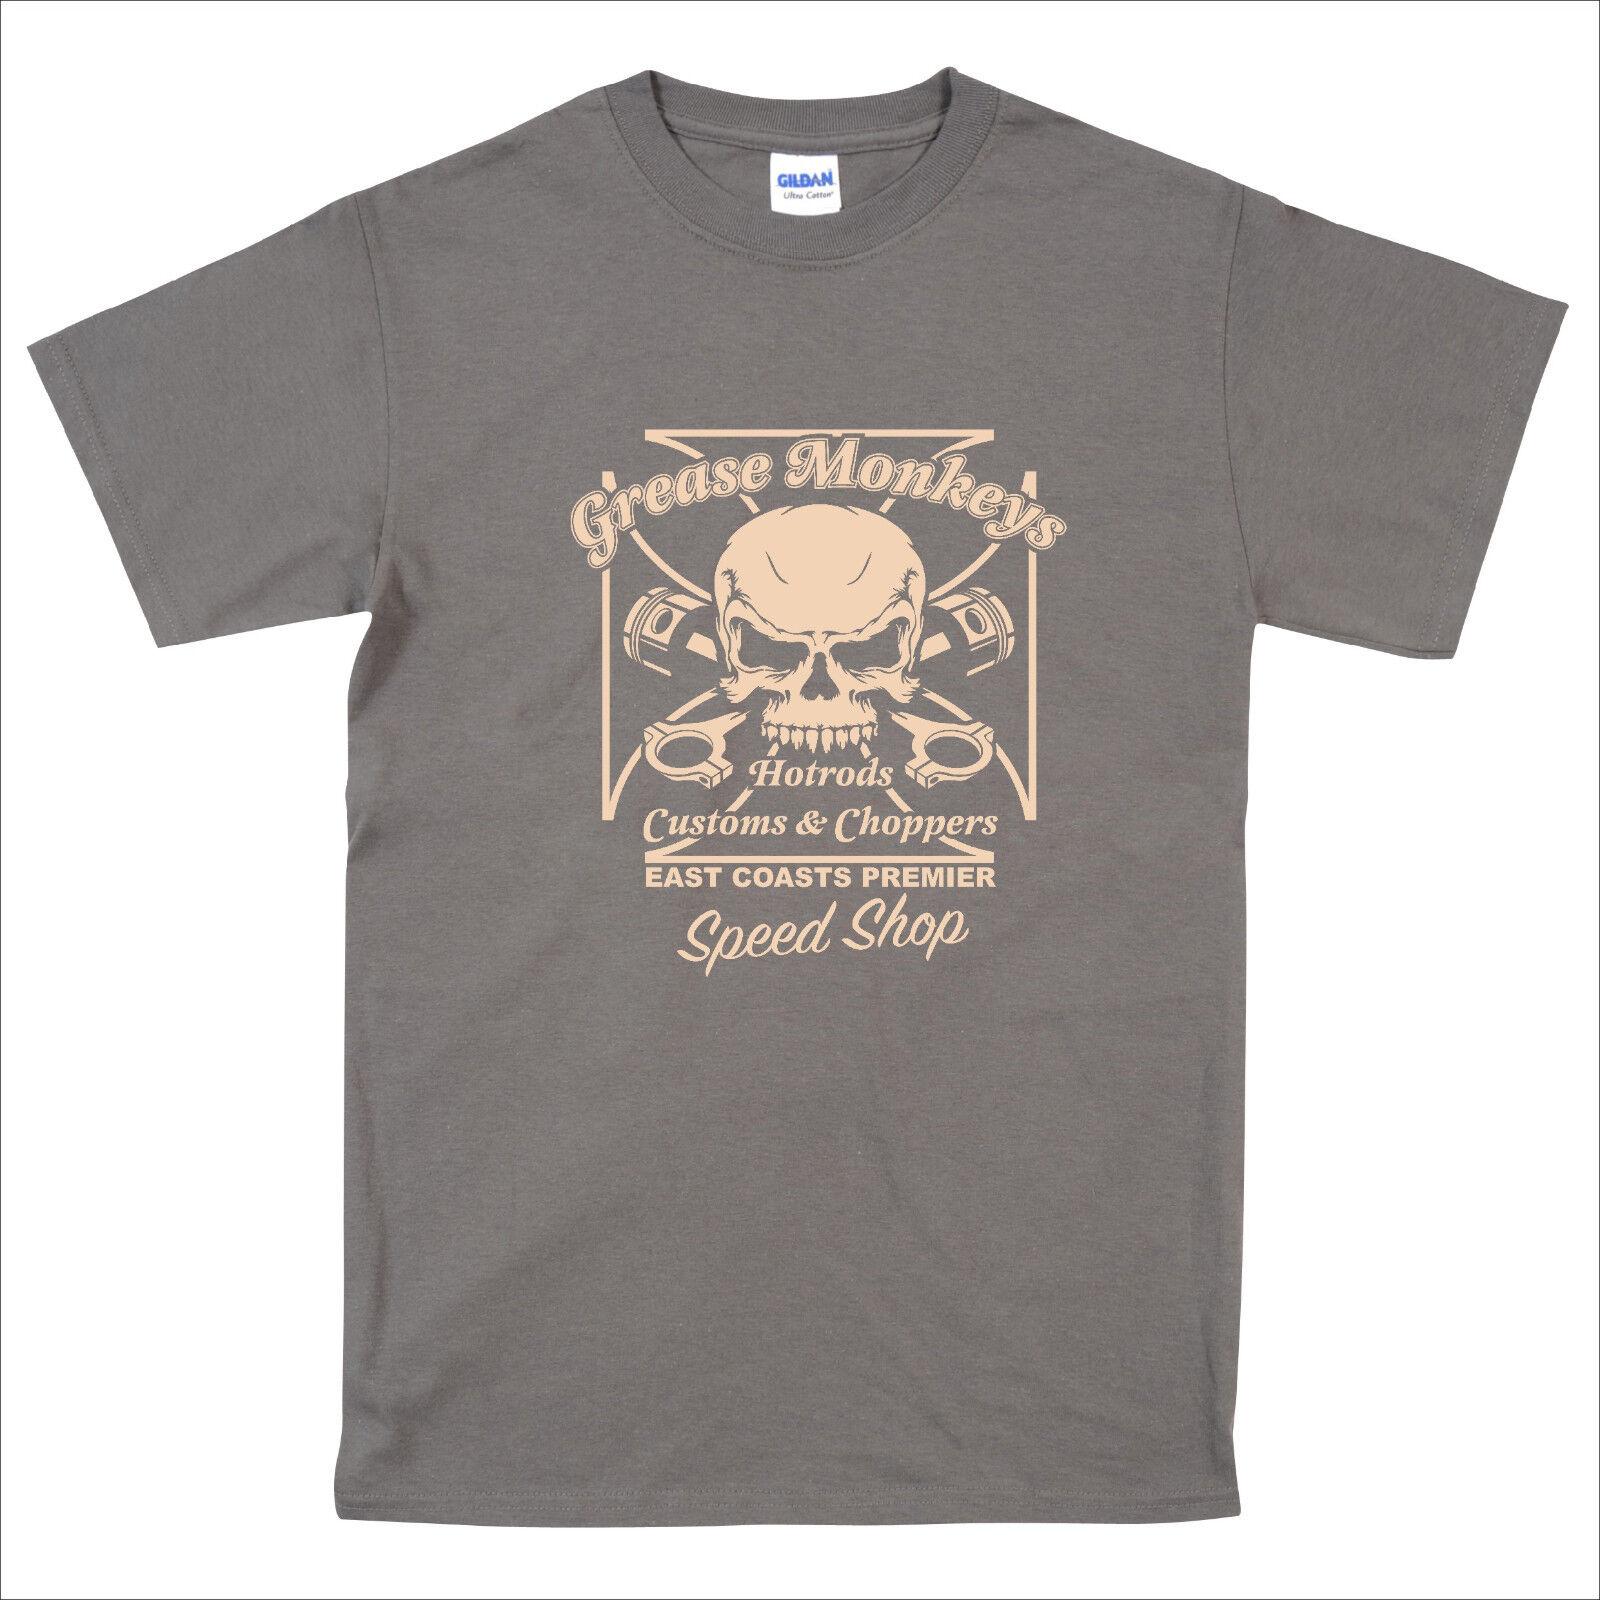 Motard Chopper Bobber Classic car HOT ROD MONKEY GREASE MONKEY ROD Speed Shop T Shirt S-5XL 7bebee